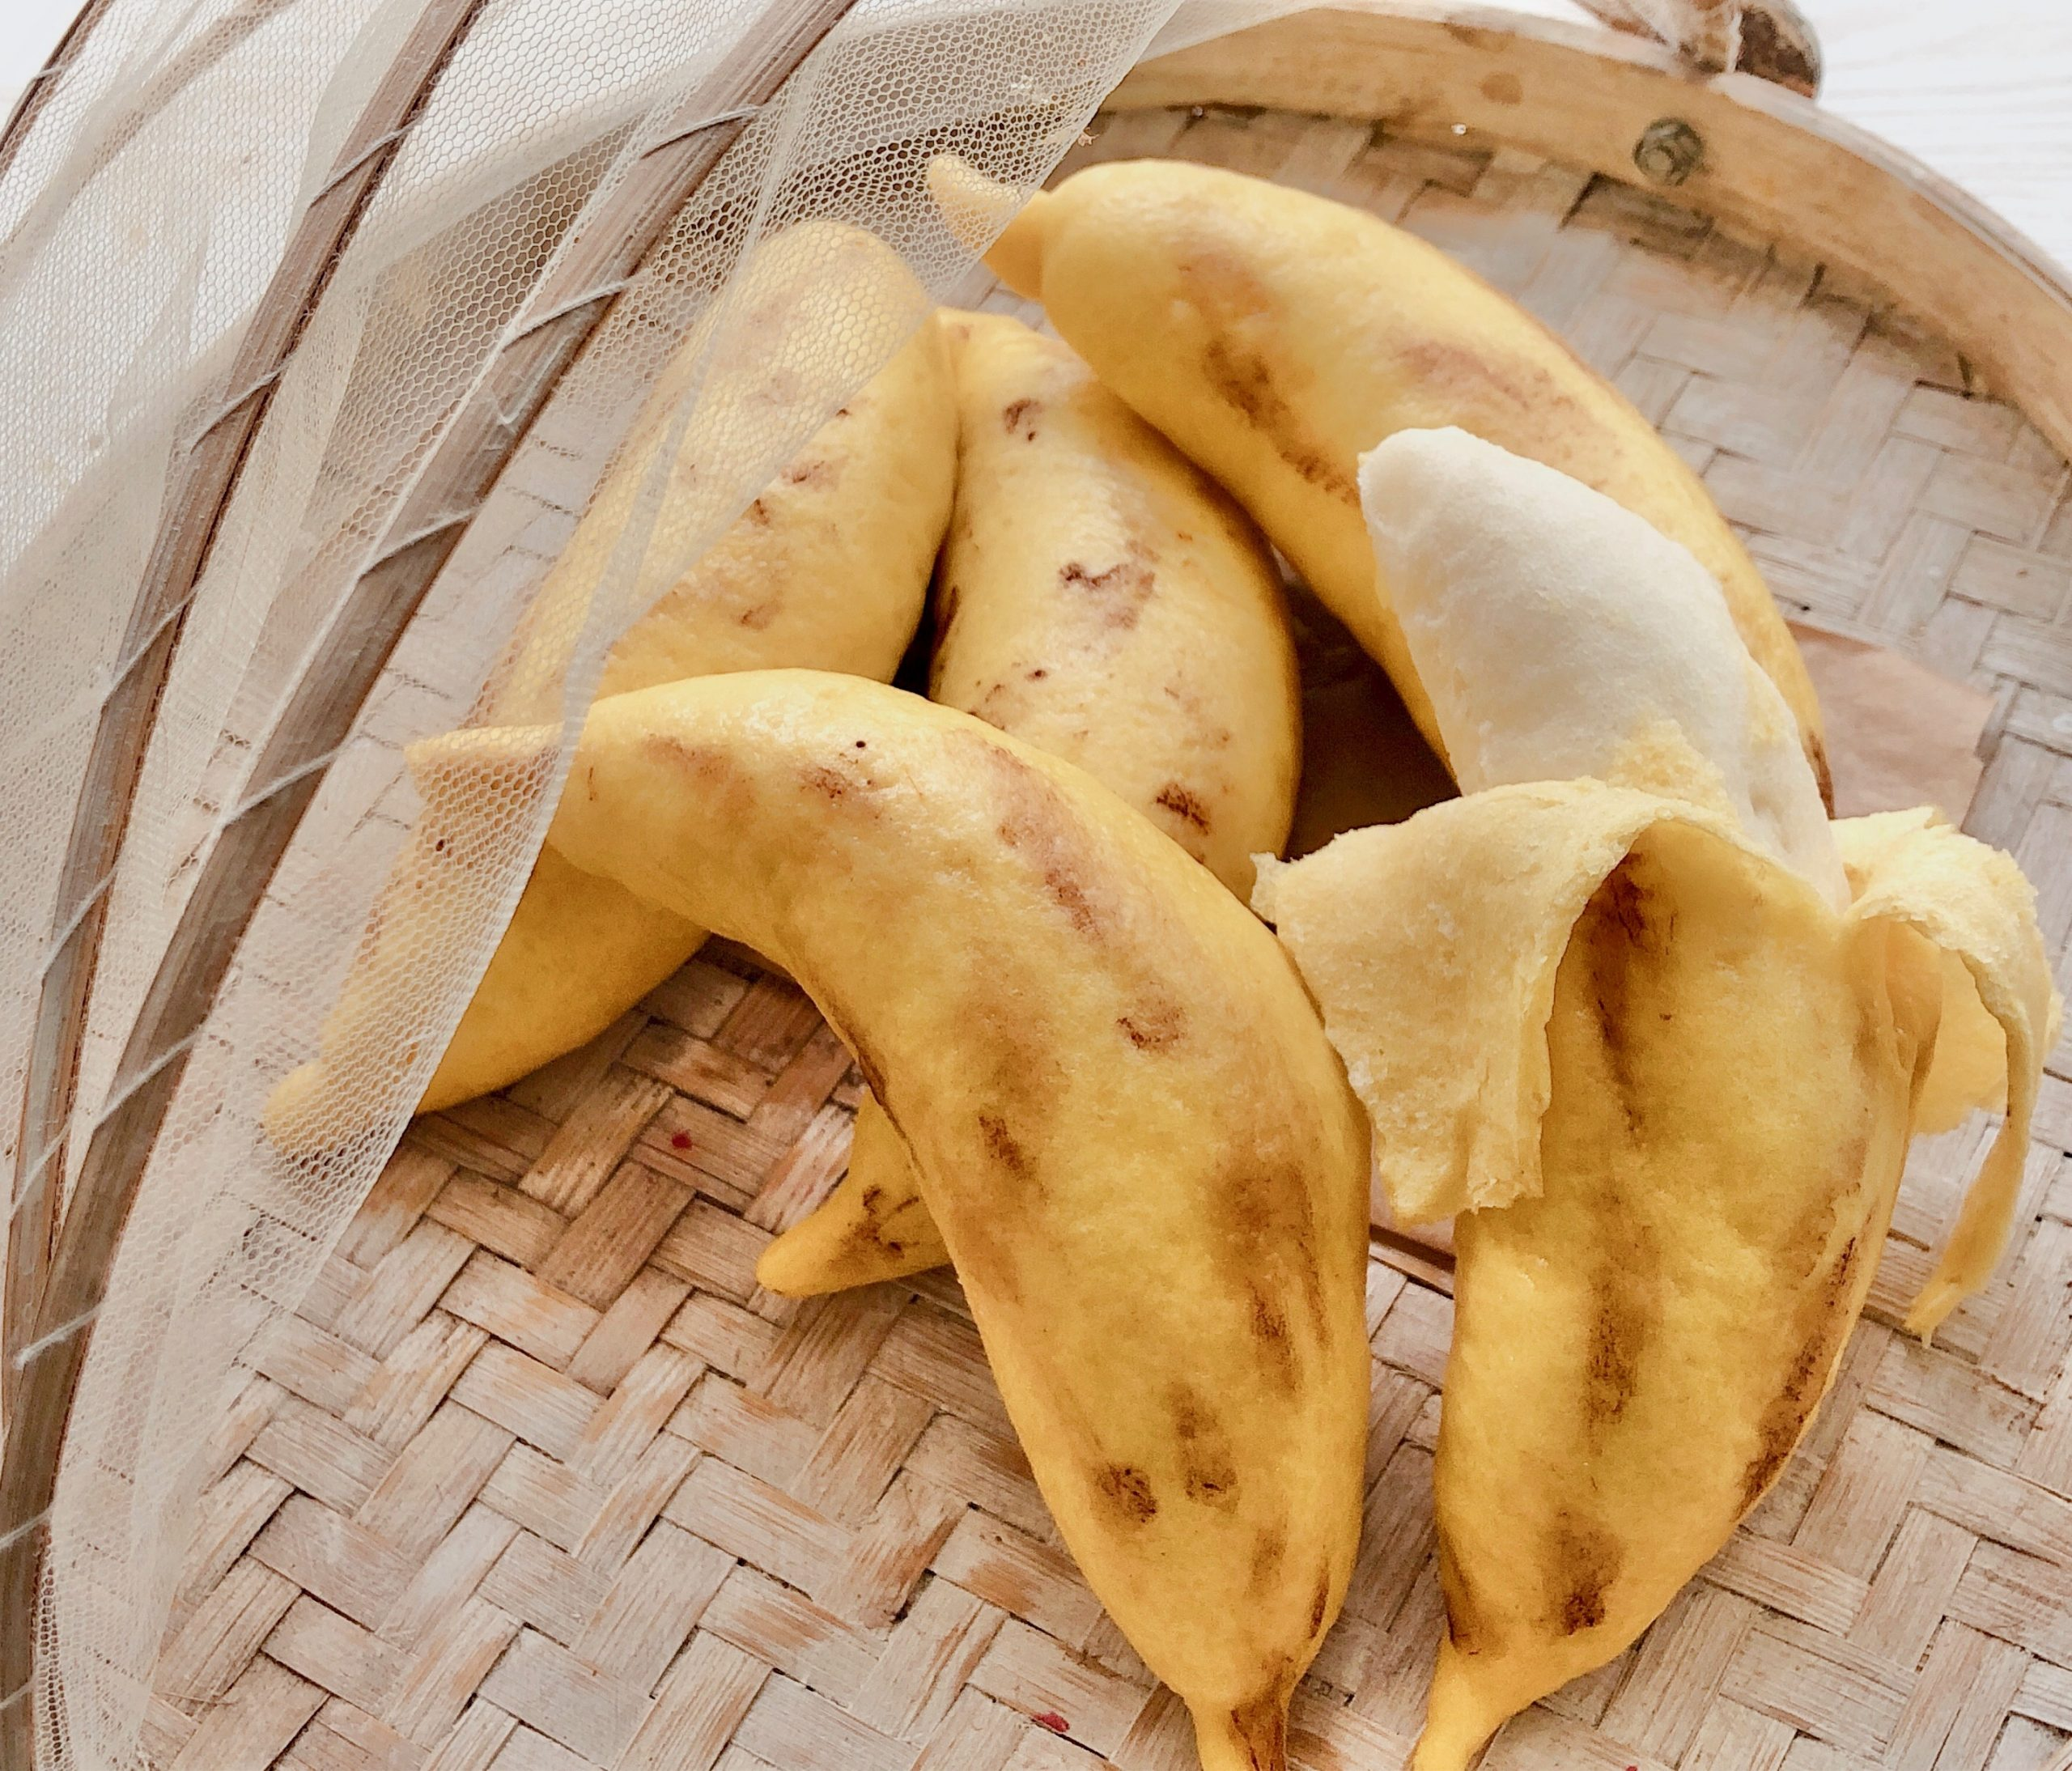 u can even eat the skin ~ banana mantou 连皮都能吃的香蕉馒头